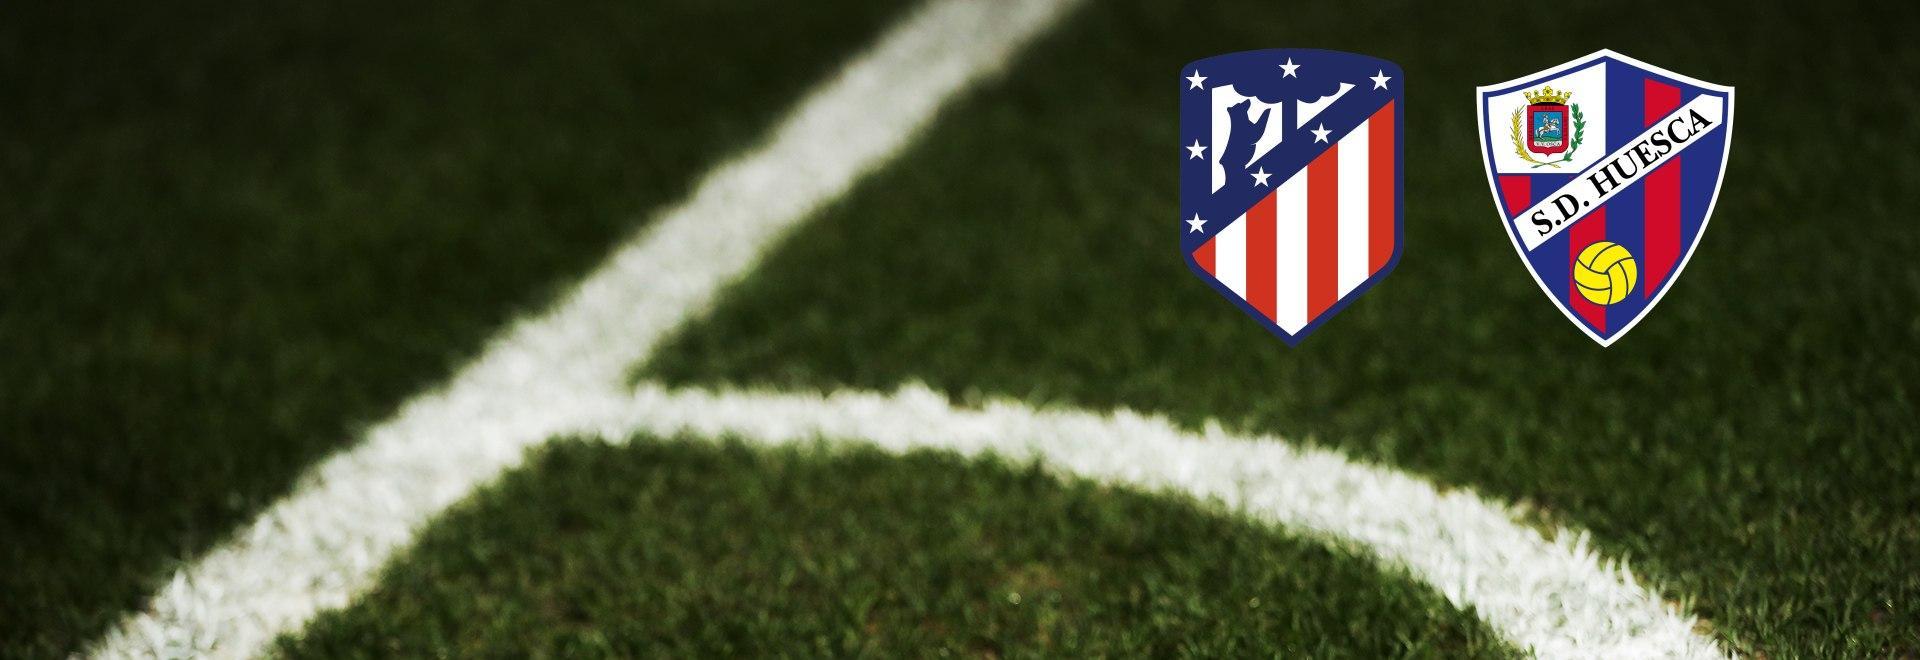 Atletico Madrid - Huesca. 31a g.